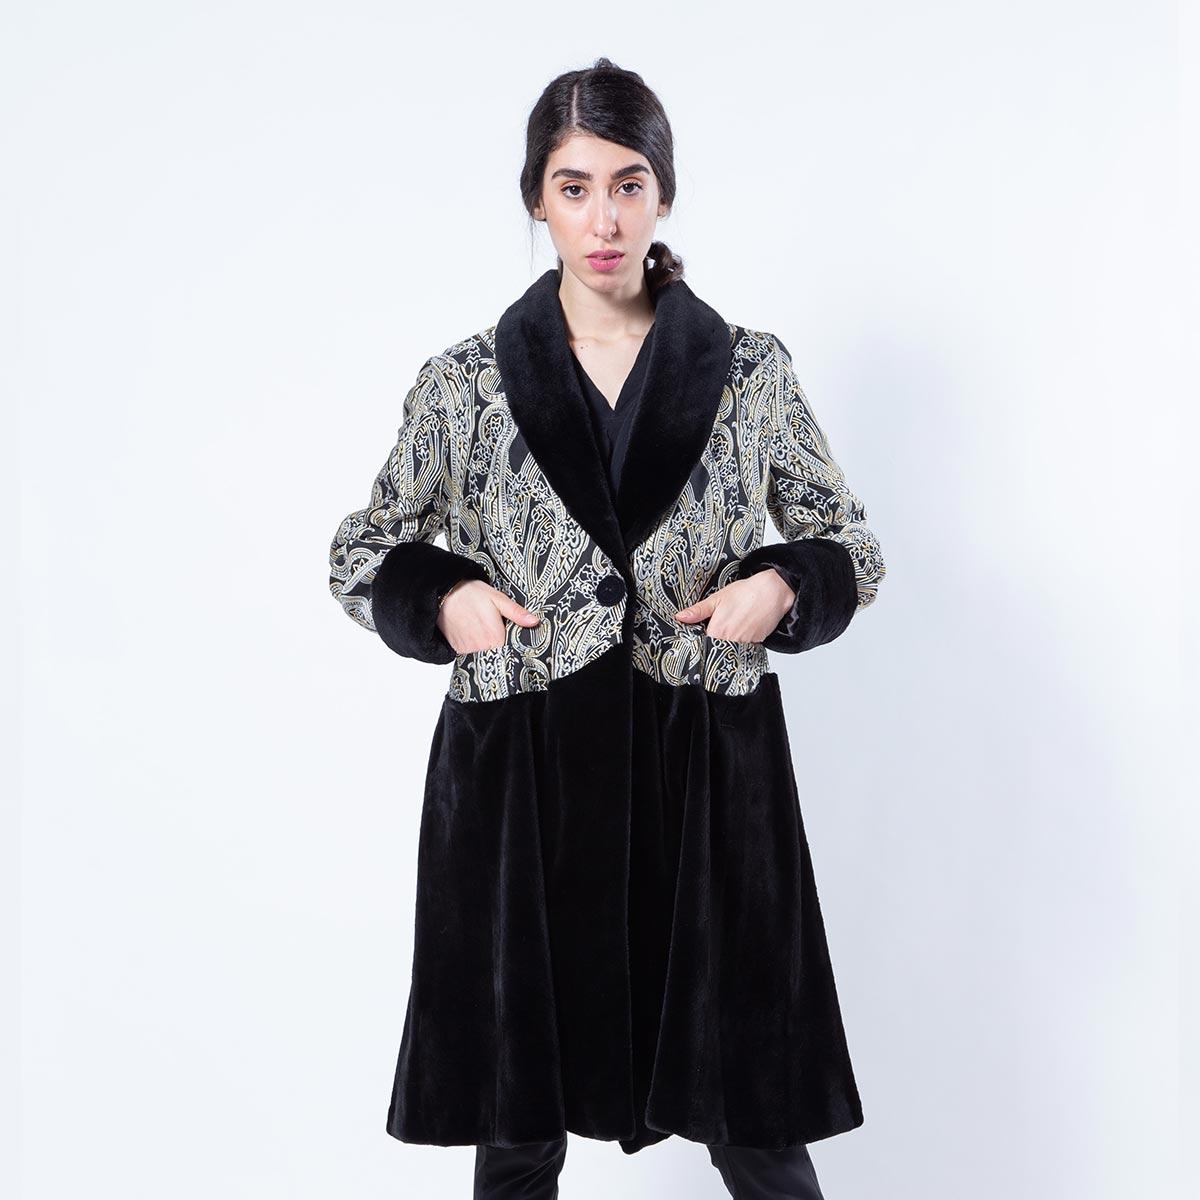 Fabric and Black Sheared Mink Coat   Шуба из ткани и стриженной норки чёрного цвета - Sarigianni Furs